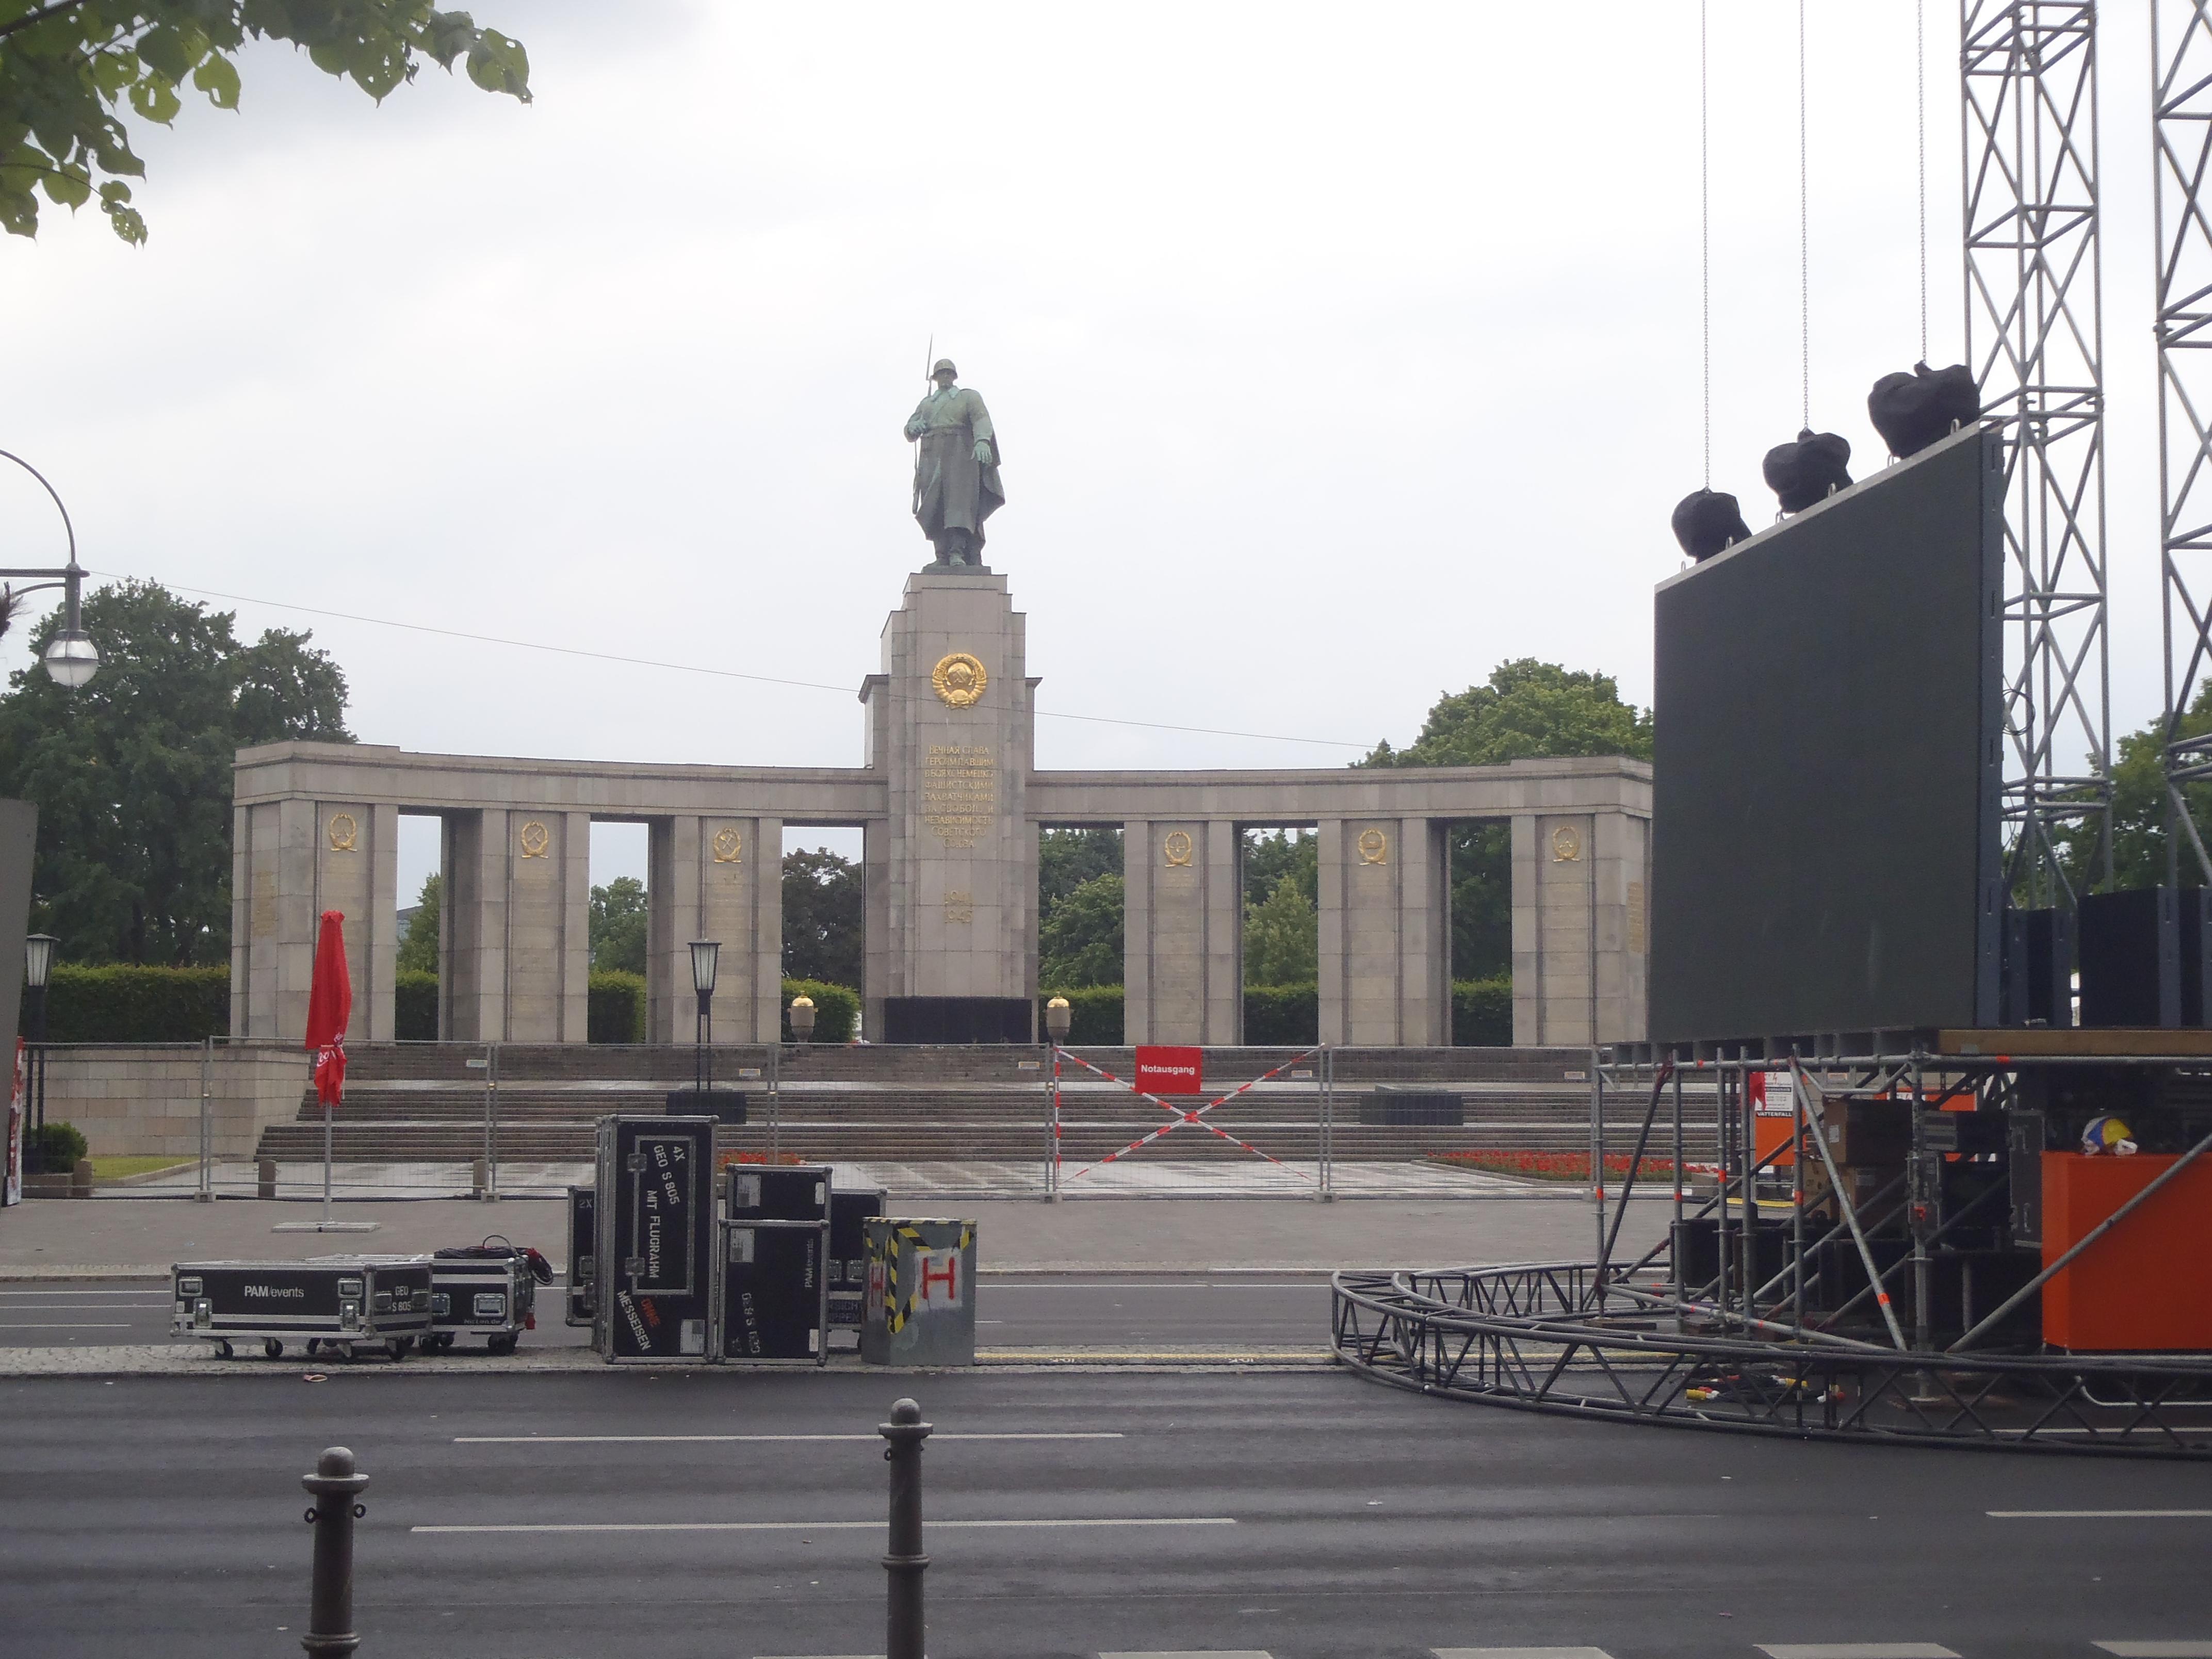 Russisches Kriegsdenkmal (Russian War Memorial)